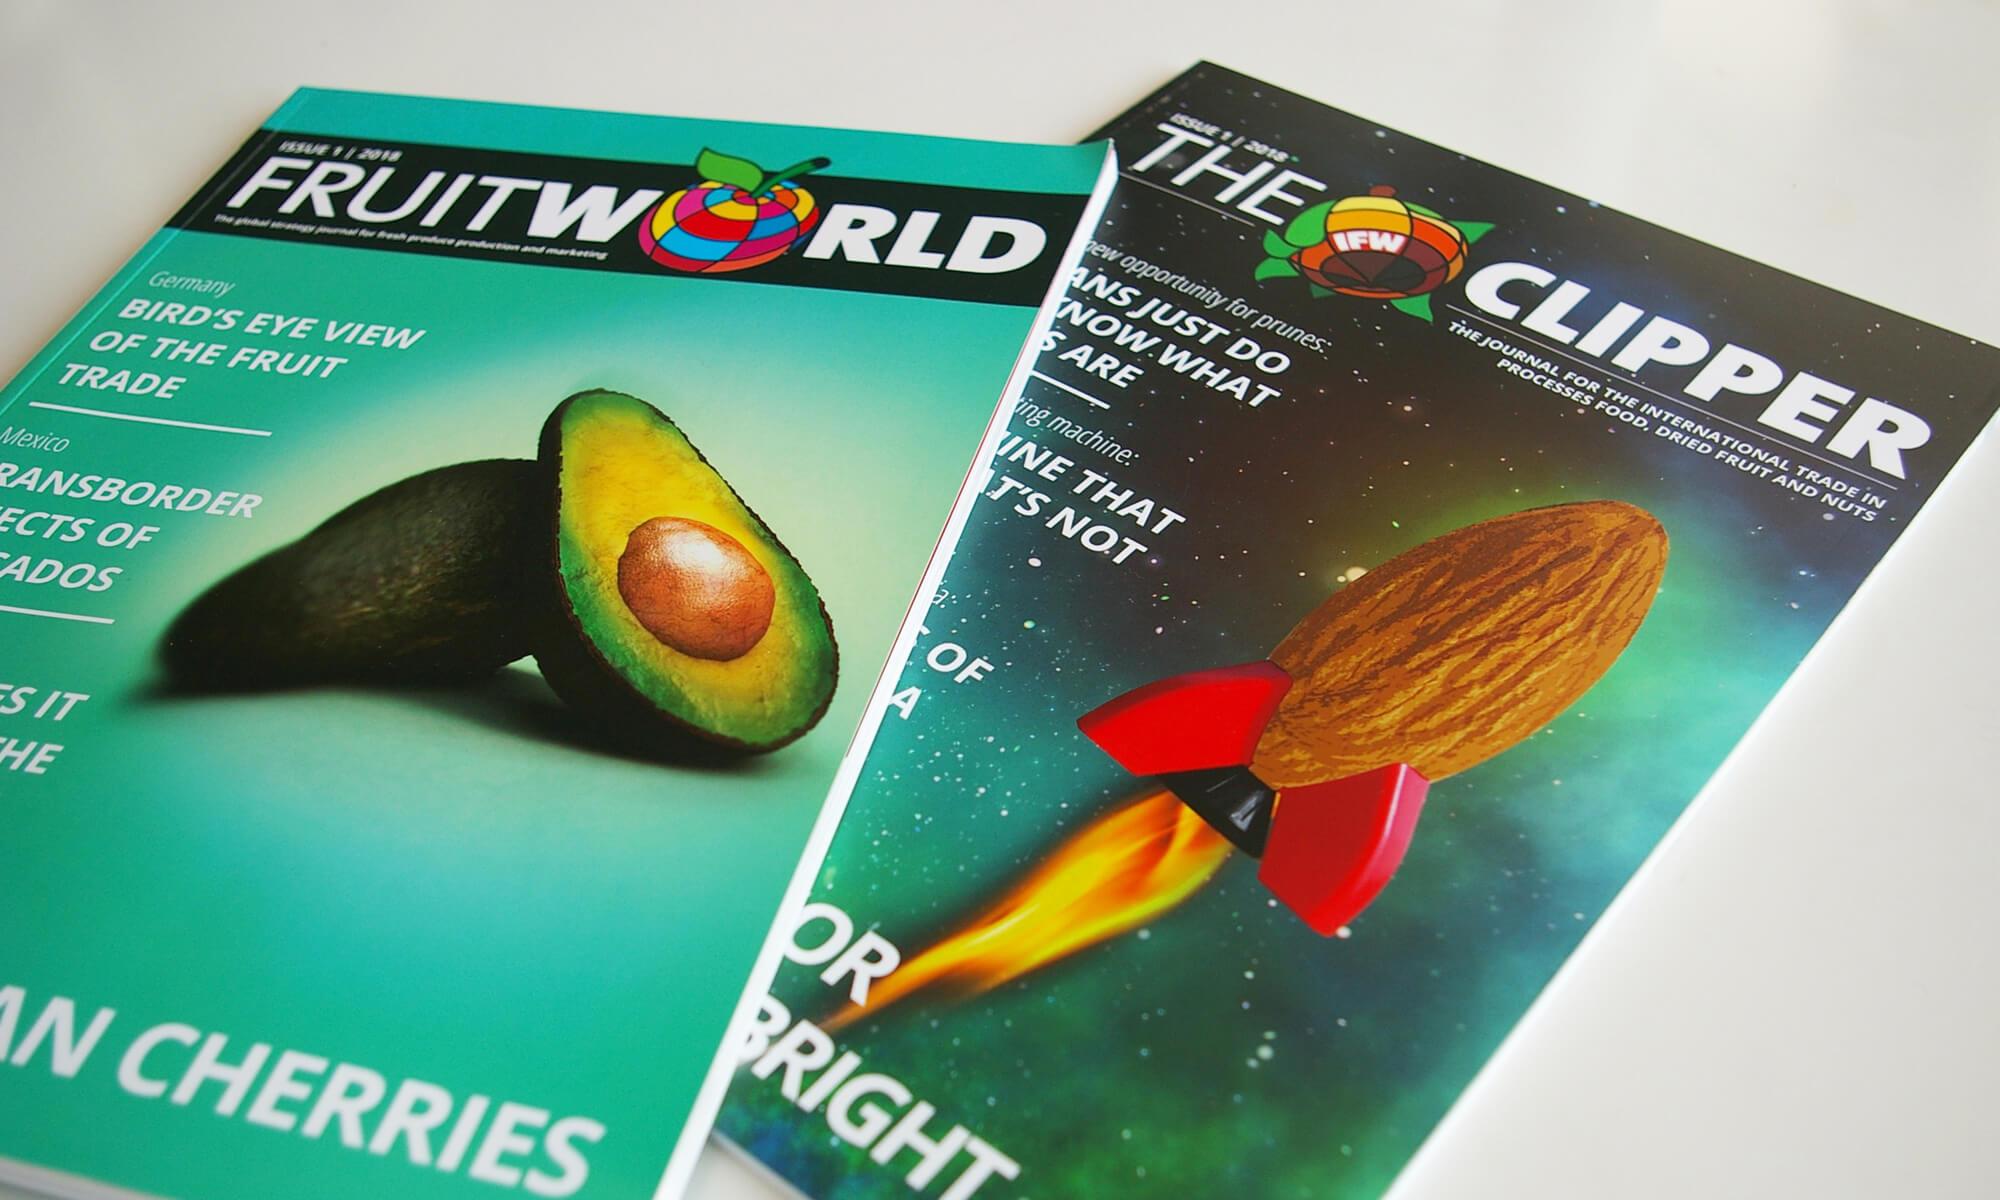 The Fruitworld 1-2018 & The Clipper 1-2018